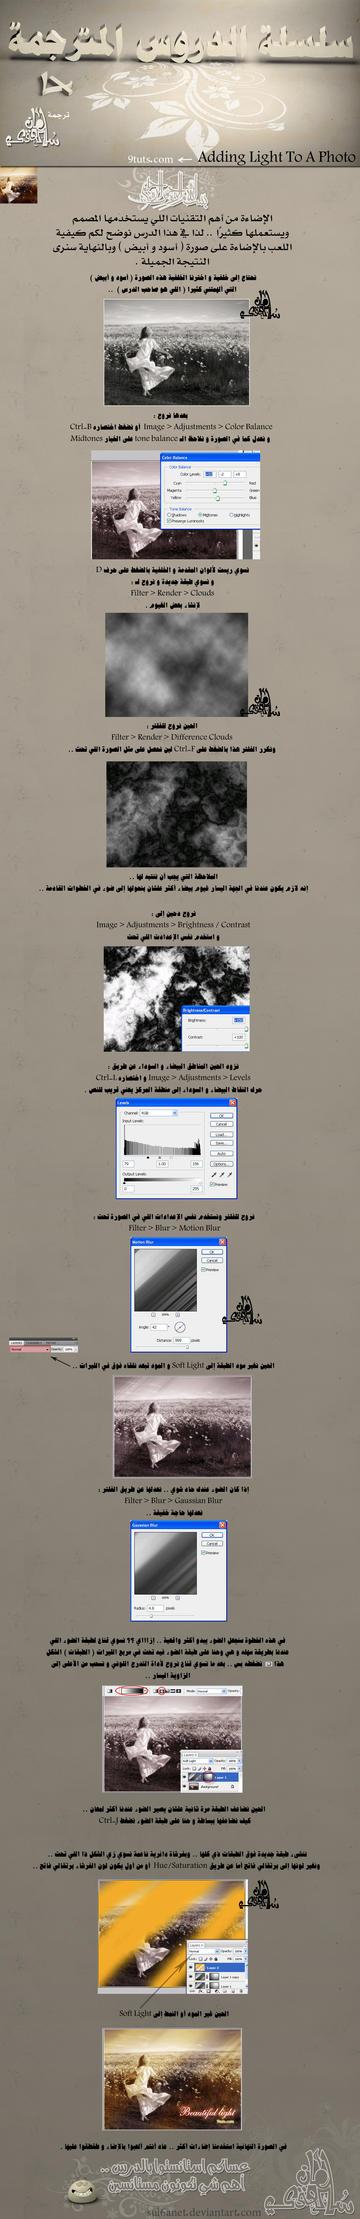 translator Tutorial 4 by sul6anet